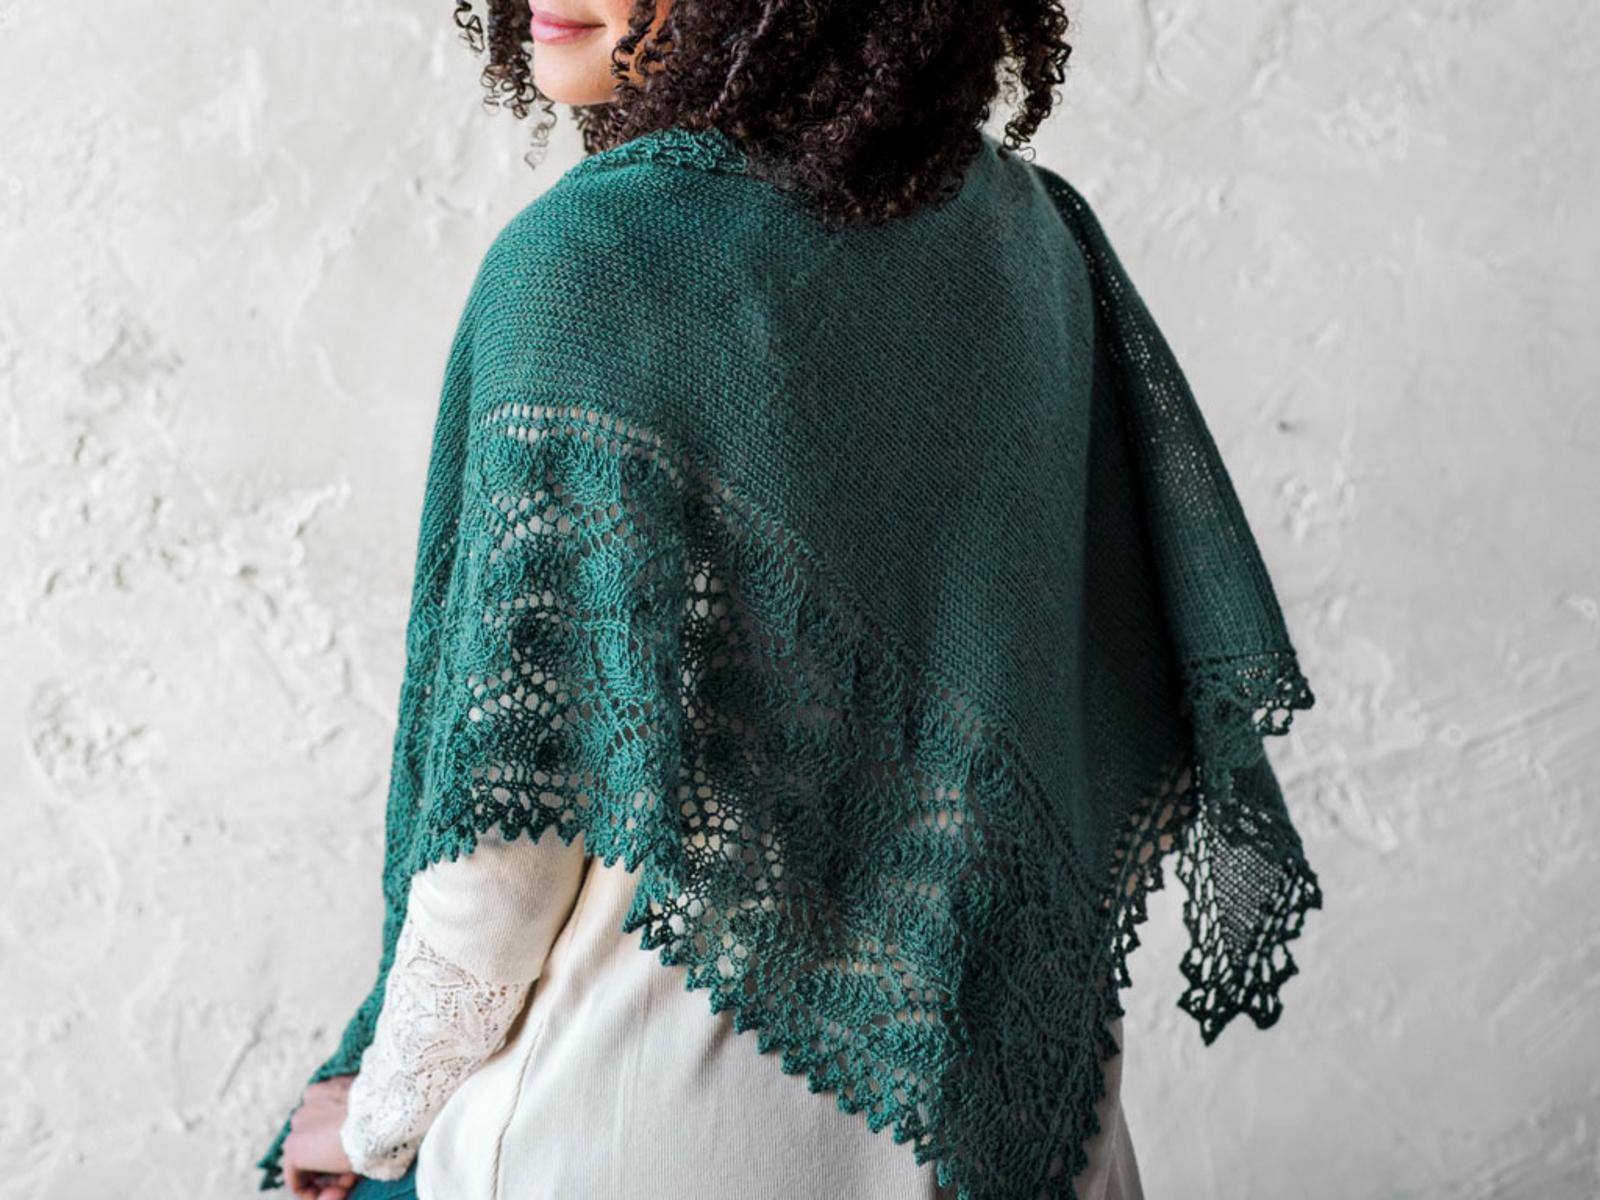 Estonian Dreams Lace Shawl Kit